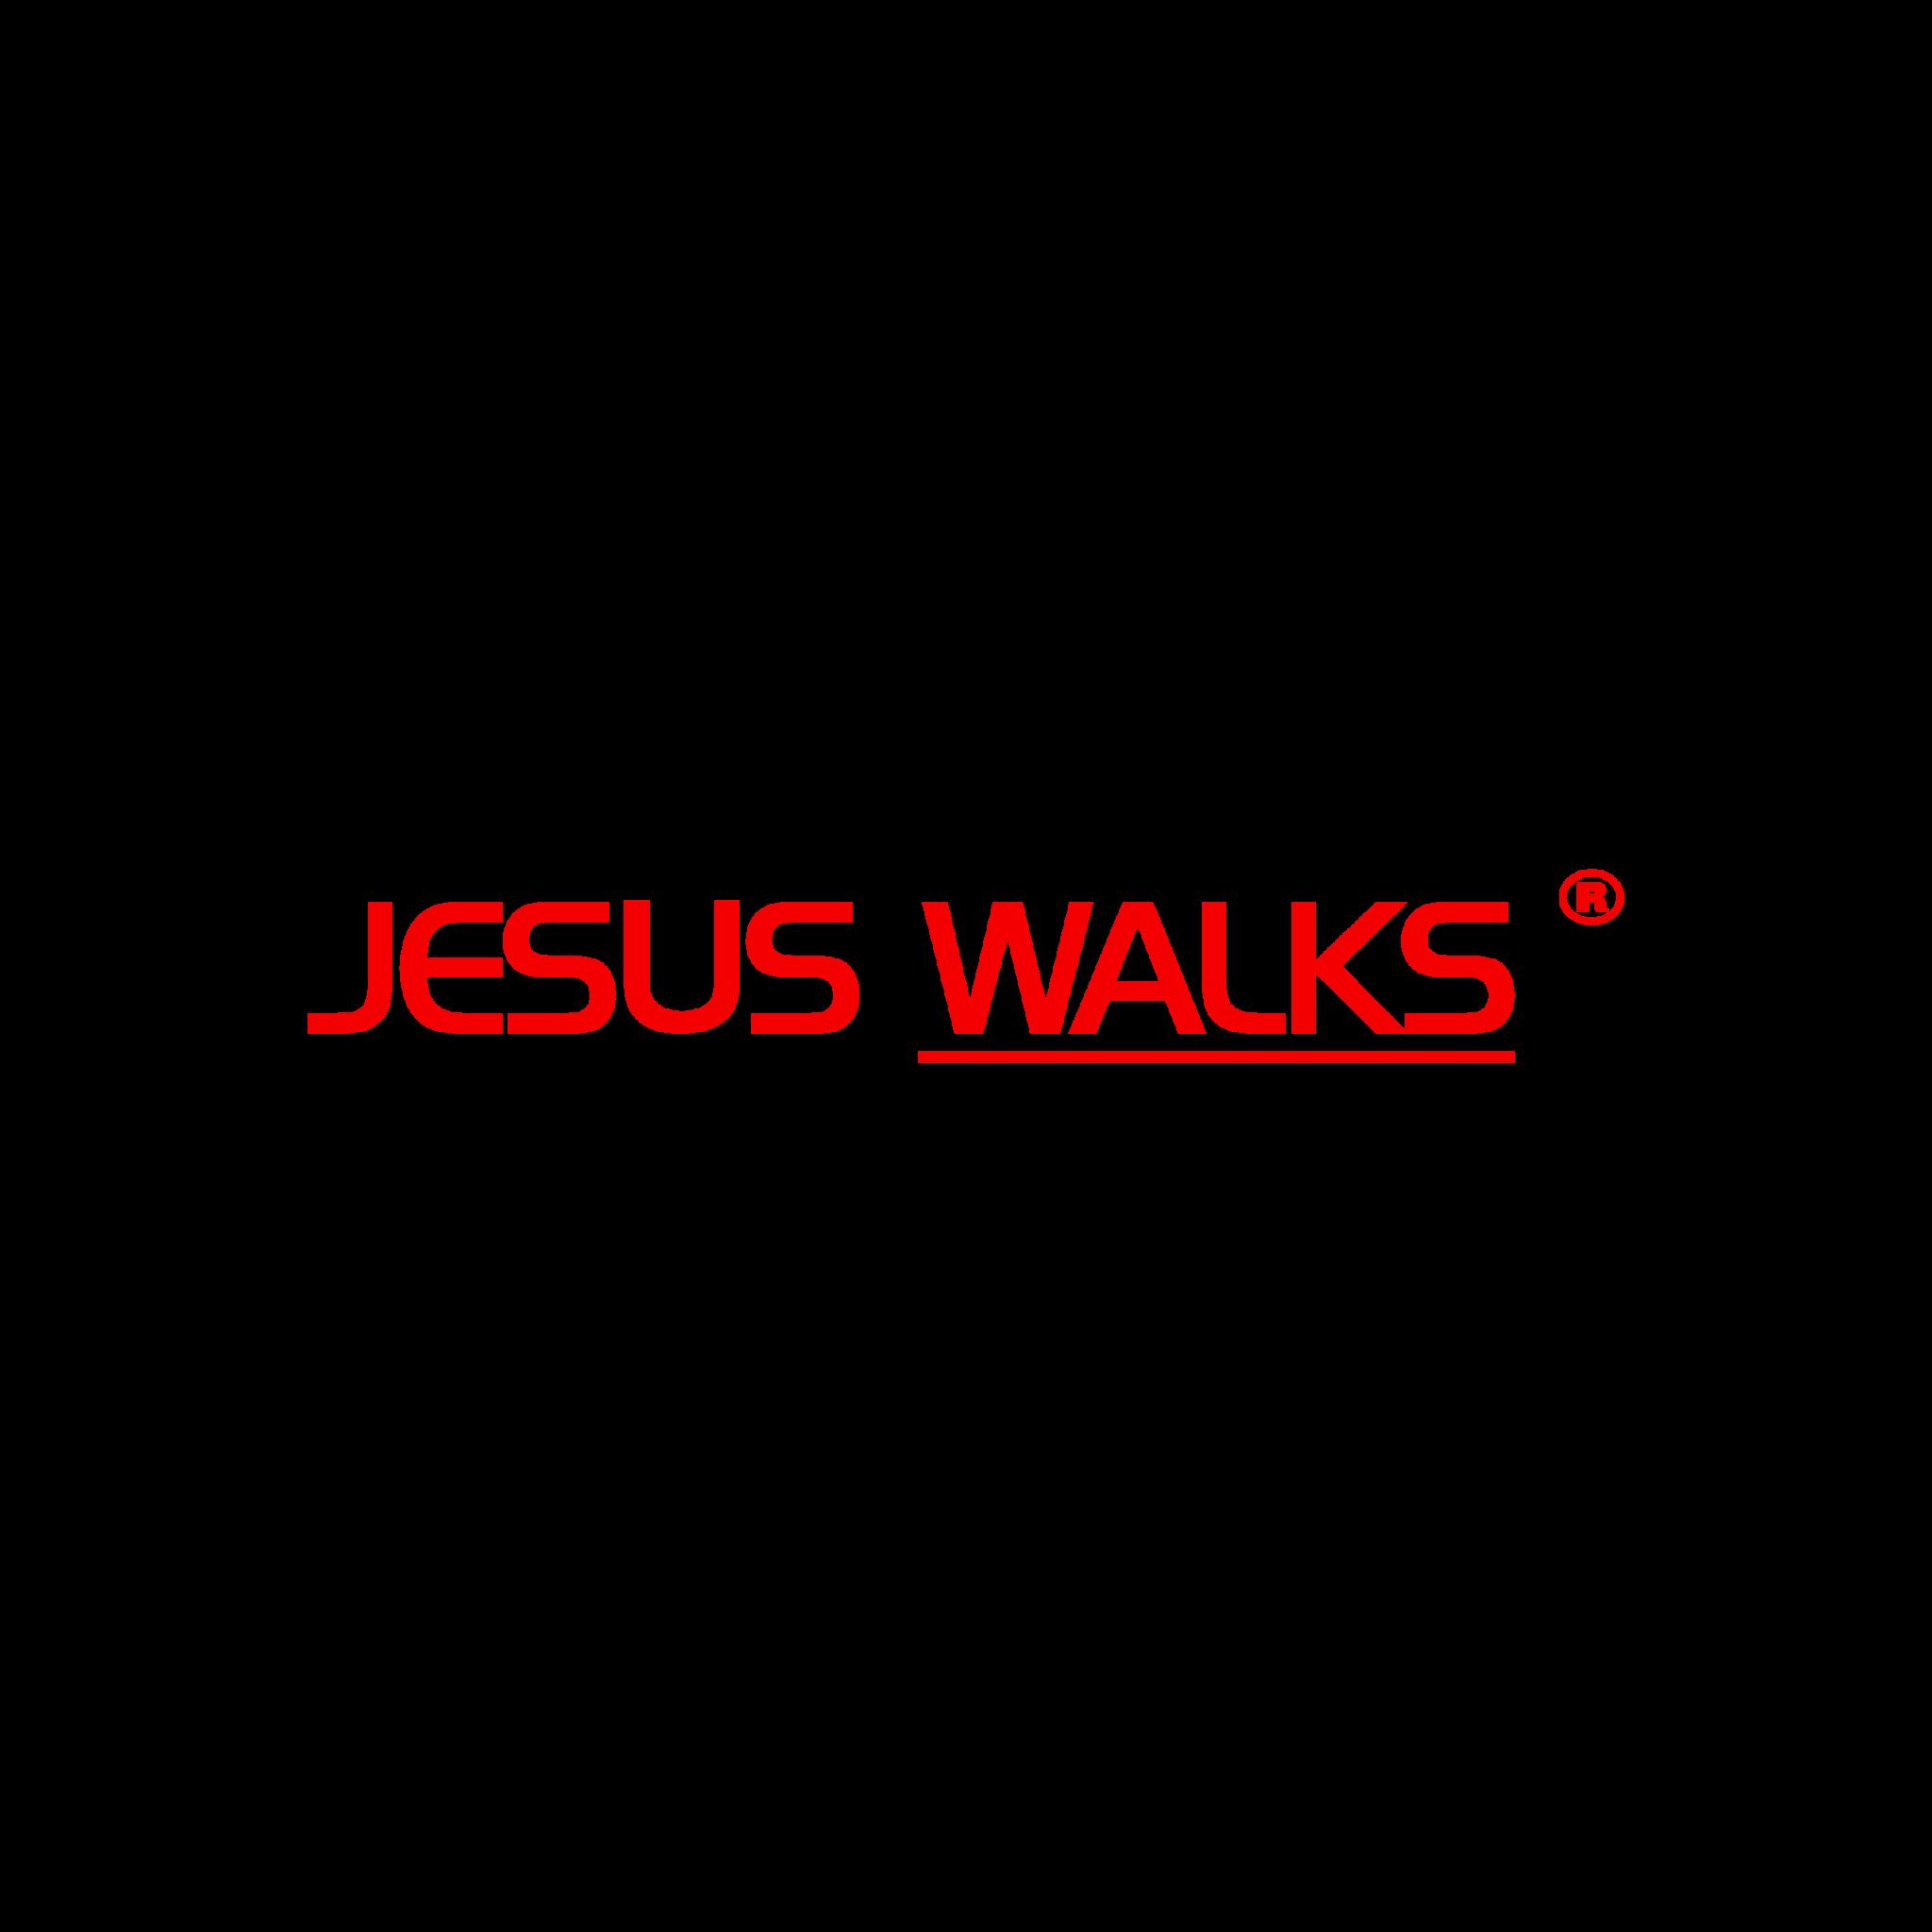 jesuswalks life b3xa1umzNWIAiToswppbFvtrErN-eTVnofocp02MaUOFWfhRRlFIB8IdYIHUMbUsO2AdoRMgHCR2Hq2kRfCdHMATHbaH2ayPxSEeABdIgzqnfCscH1KrBv6aCcLze3rUMCgWmLAU=s0 10 Reasons Why Christlikeness is Necessary Blog